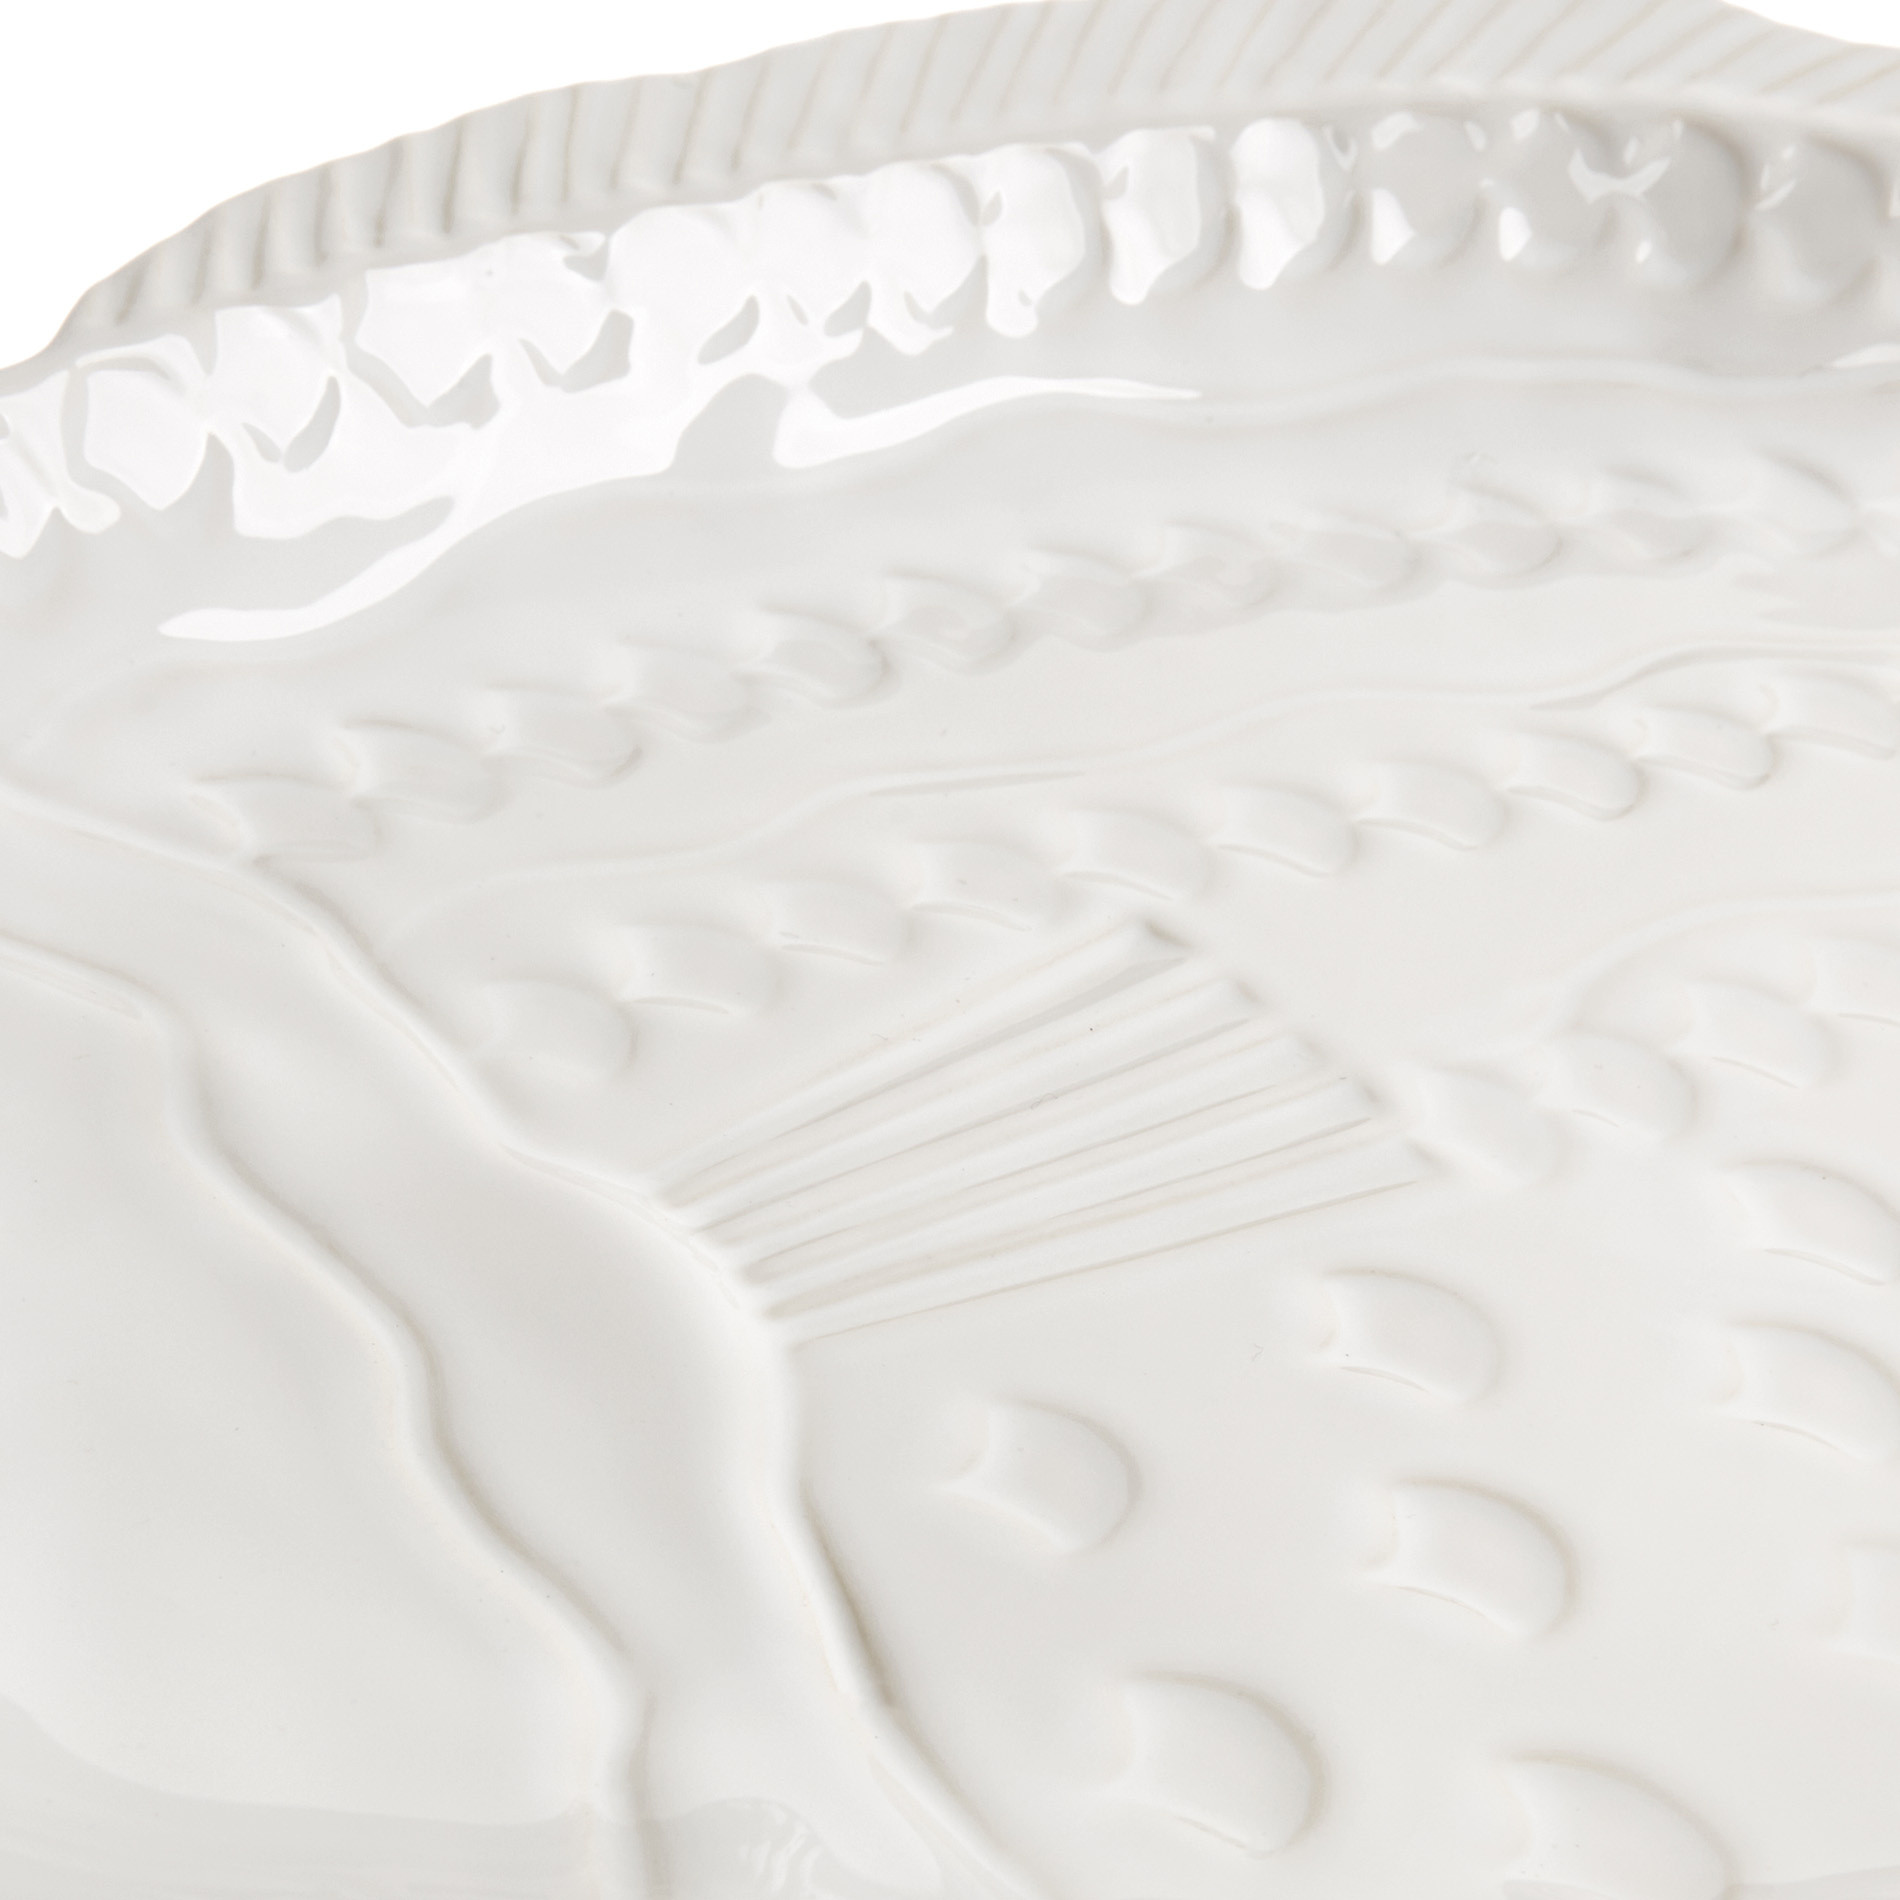 Coppa ceramica a pesce, Bianco, large image number 2